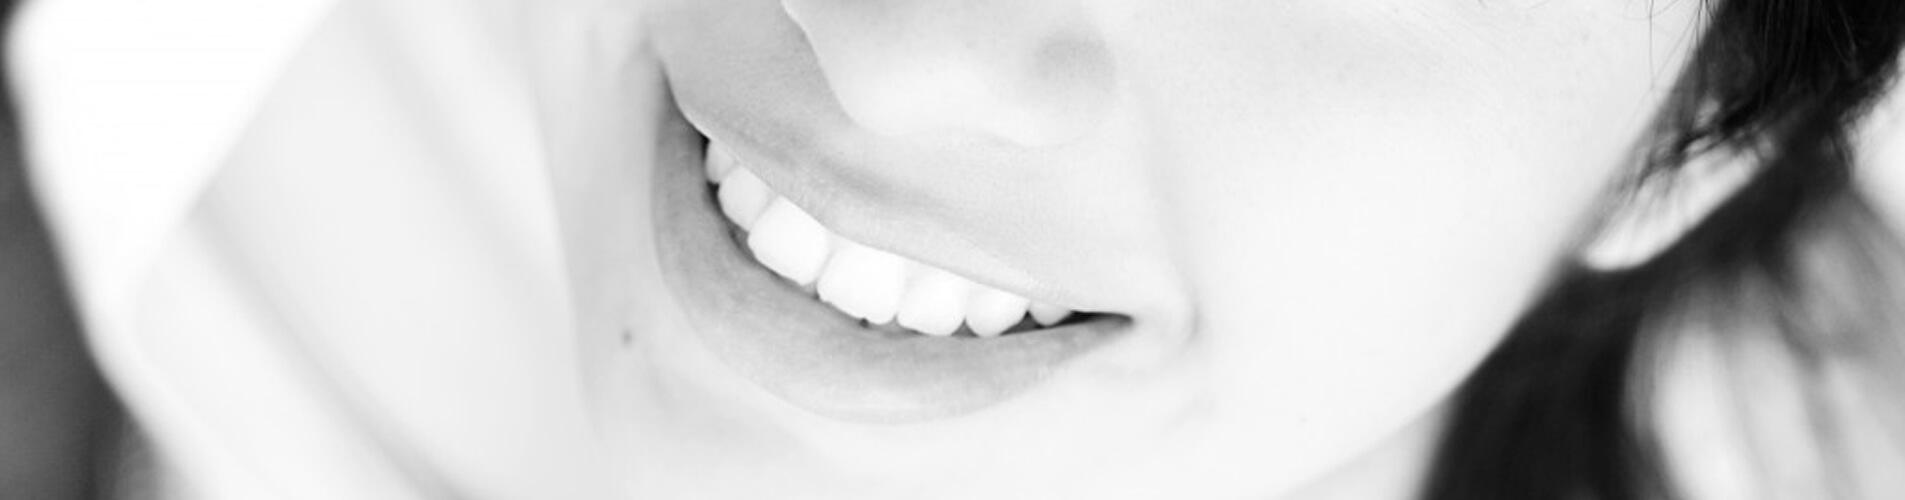 dentiste paris 16 dr oliel implant esth tique dentaire. Black Bedroom Furniture Sets. Home Design Ideas